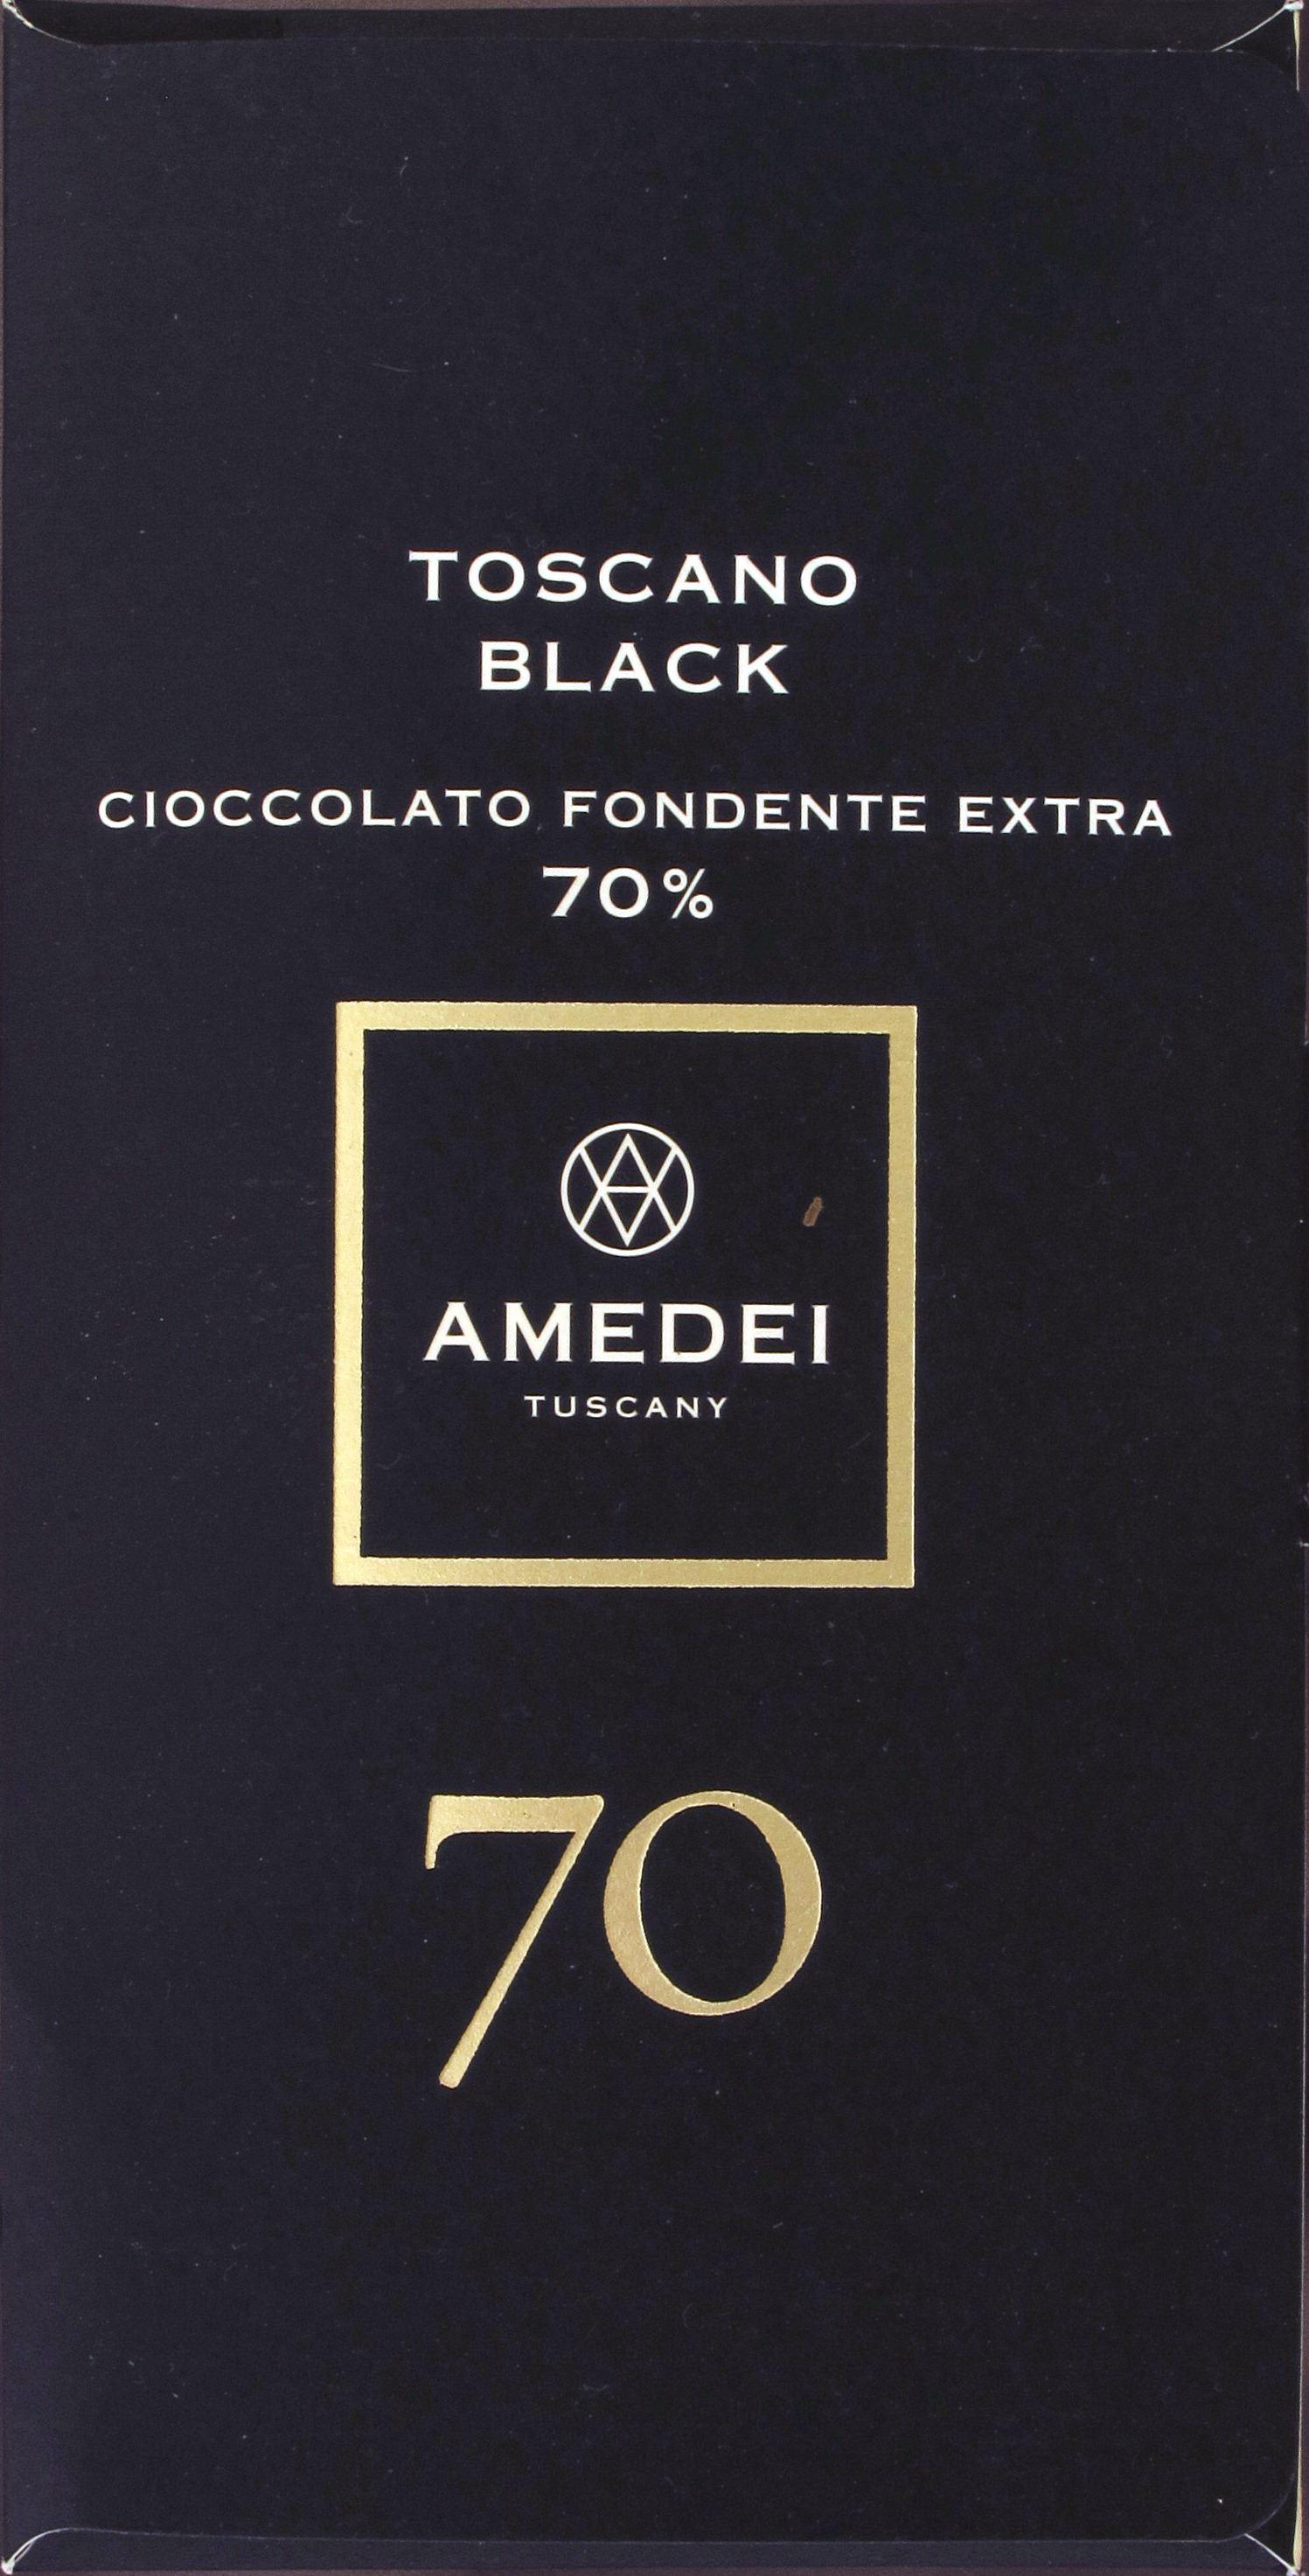 Amedei Toscano Black 70, 70%ige Dunkle Schokolade